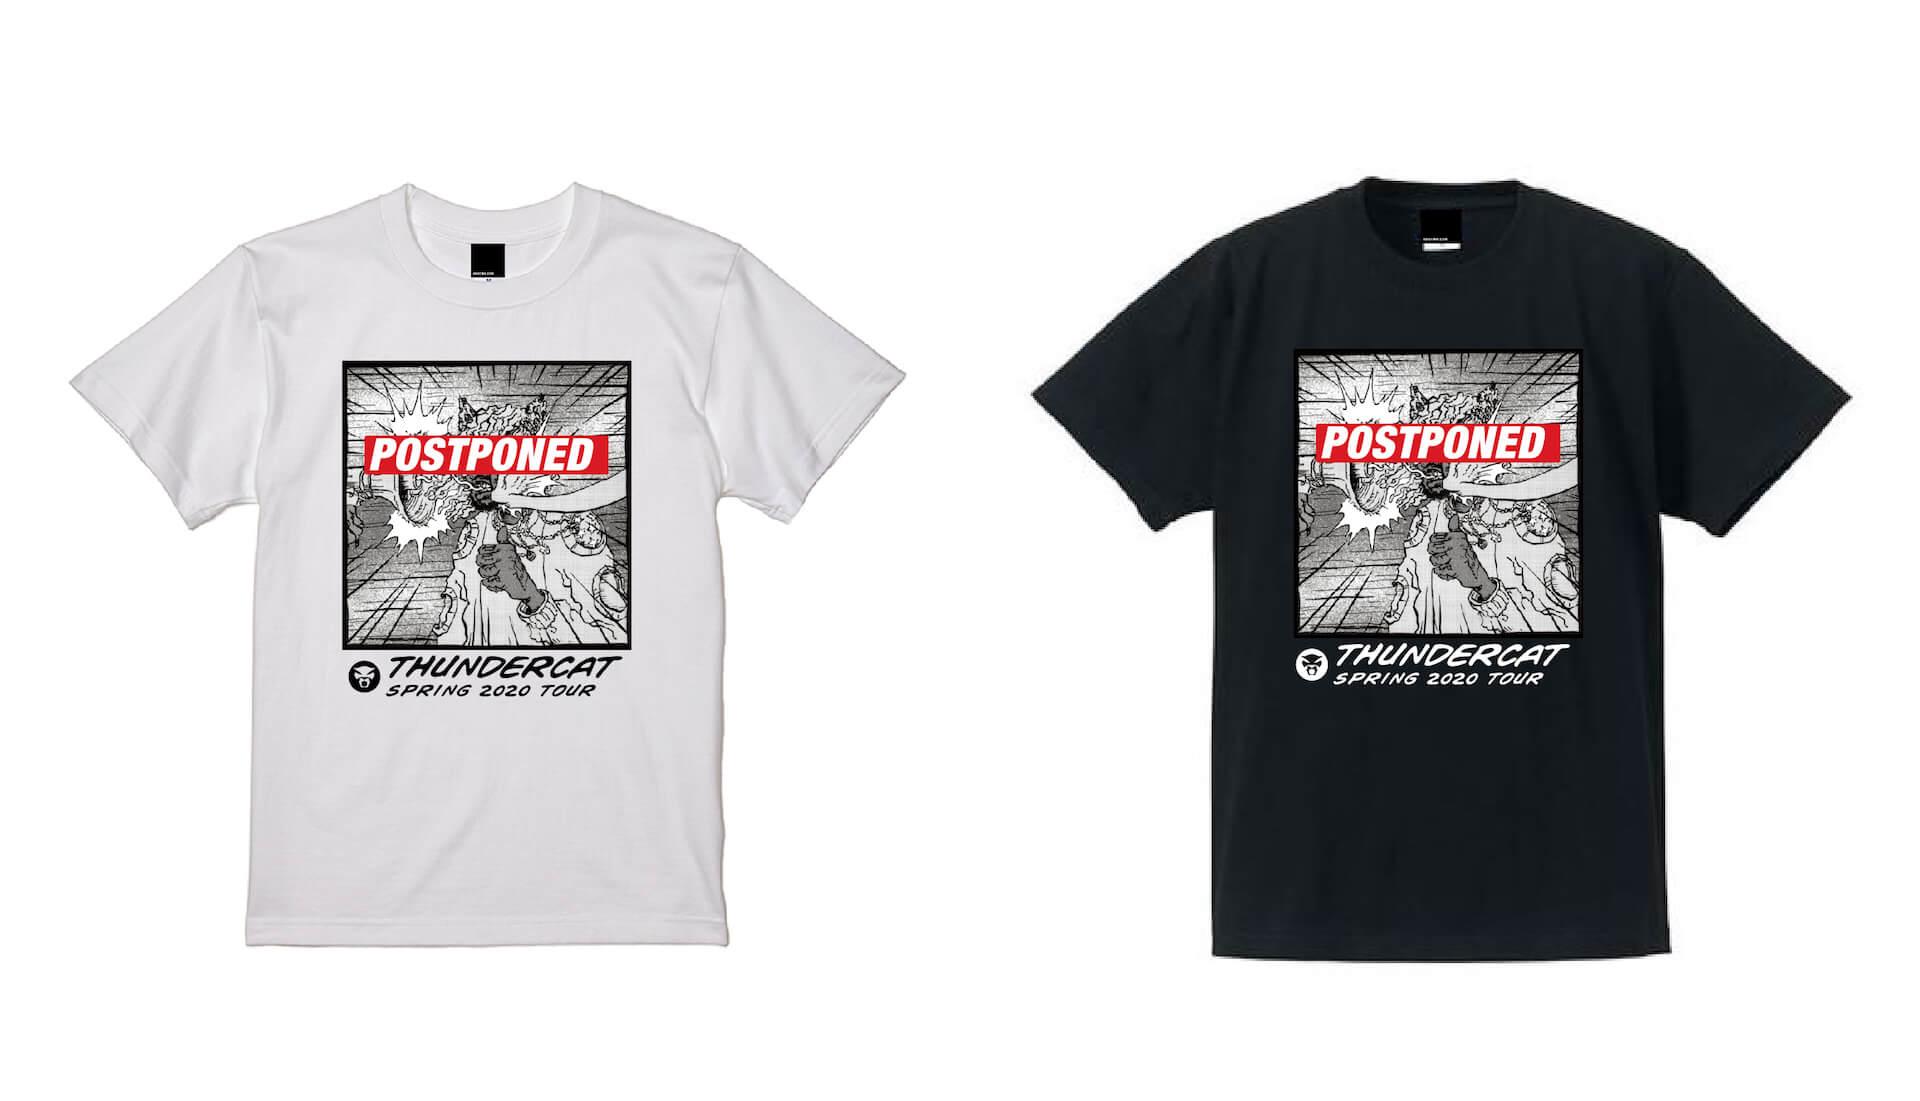 Thundercatがツアー延期Tシャツを発売!最新作『It Is What It Is』は自身初のオリコンチャートトップ10入り music200407_thundercat_tshirt_4